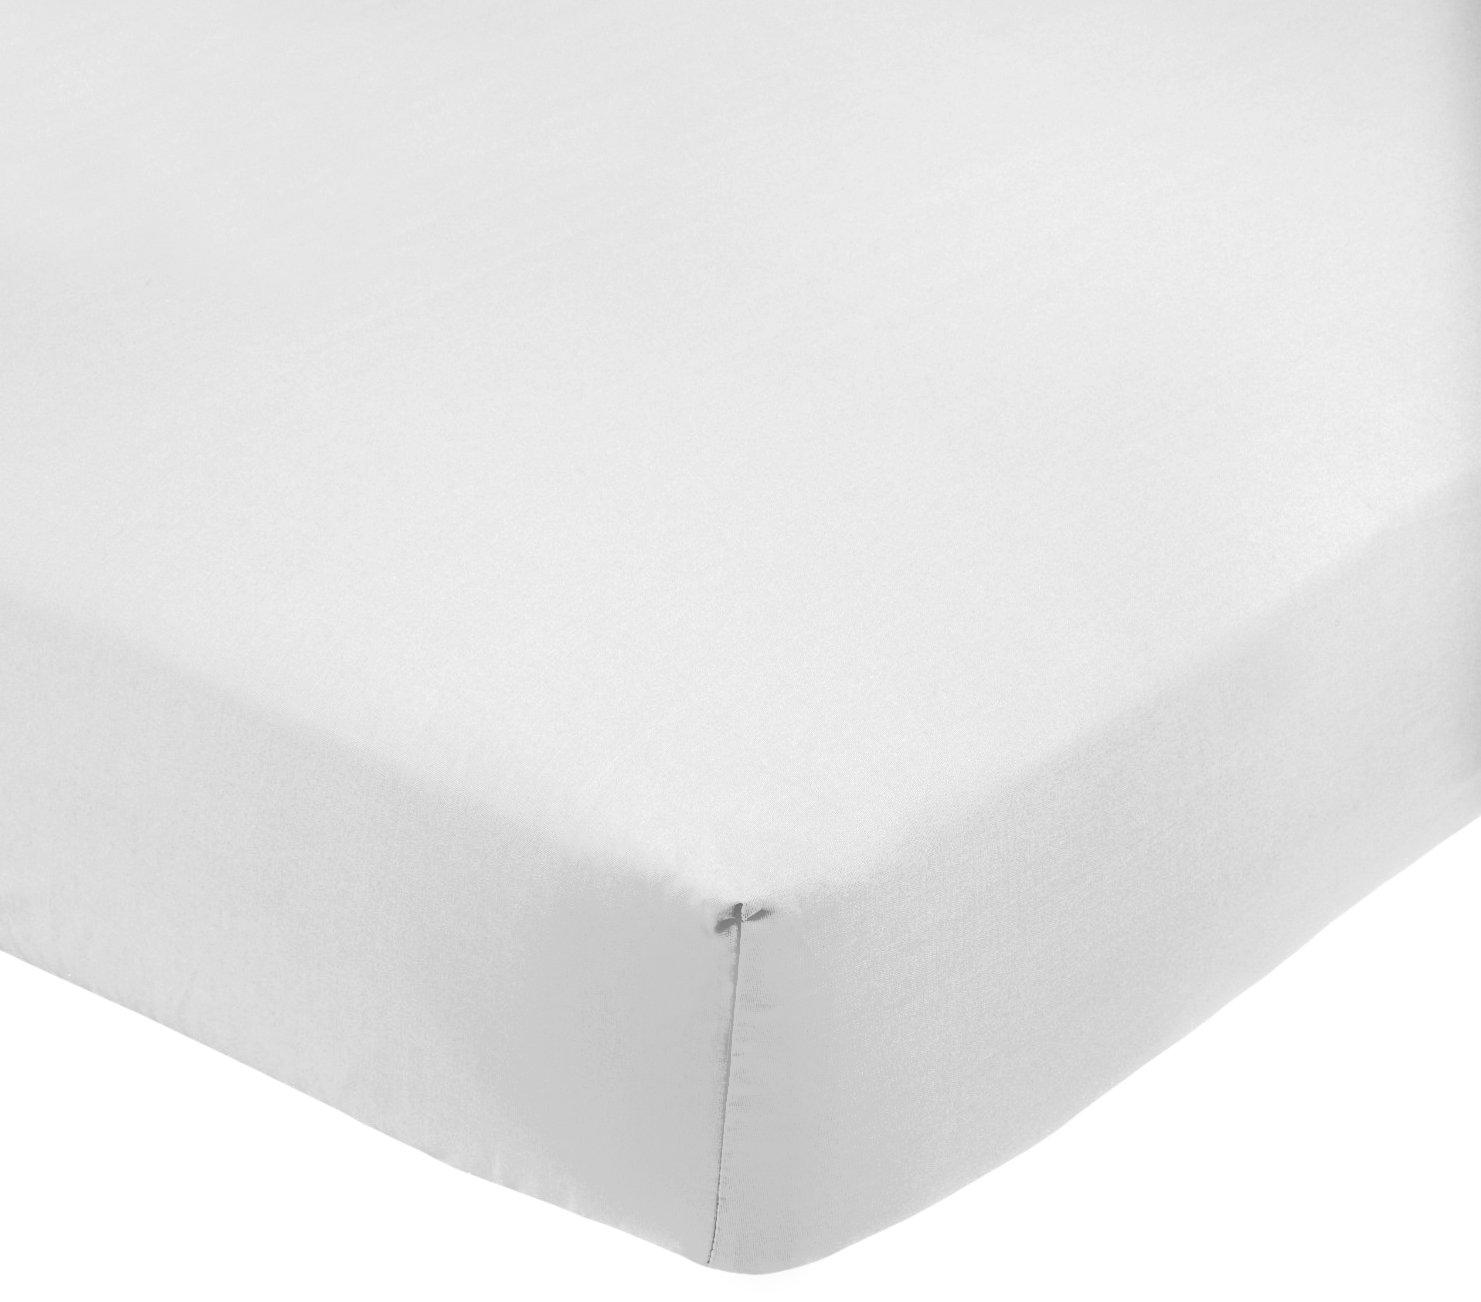 AmazonBasics - Sábana bajera ajustable (polialgodón 200 hilos) Blanco - 160 x 200 x